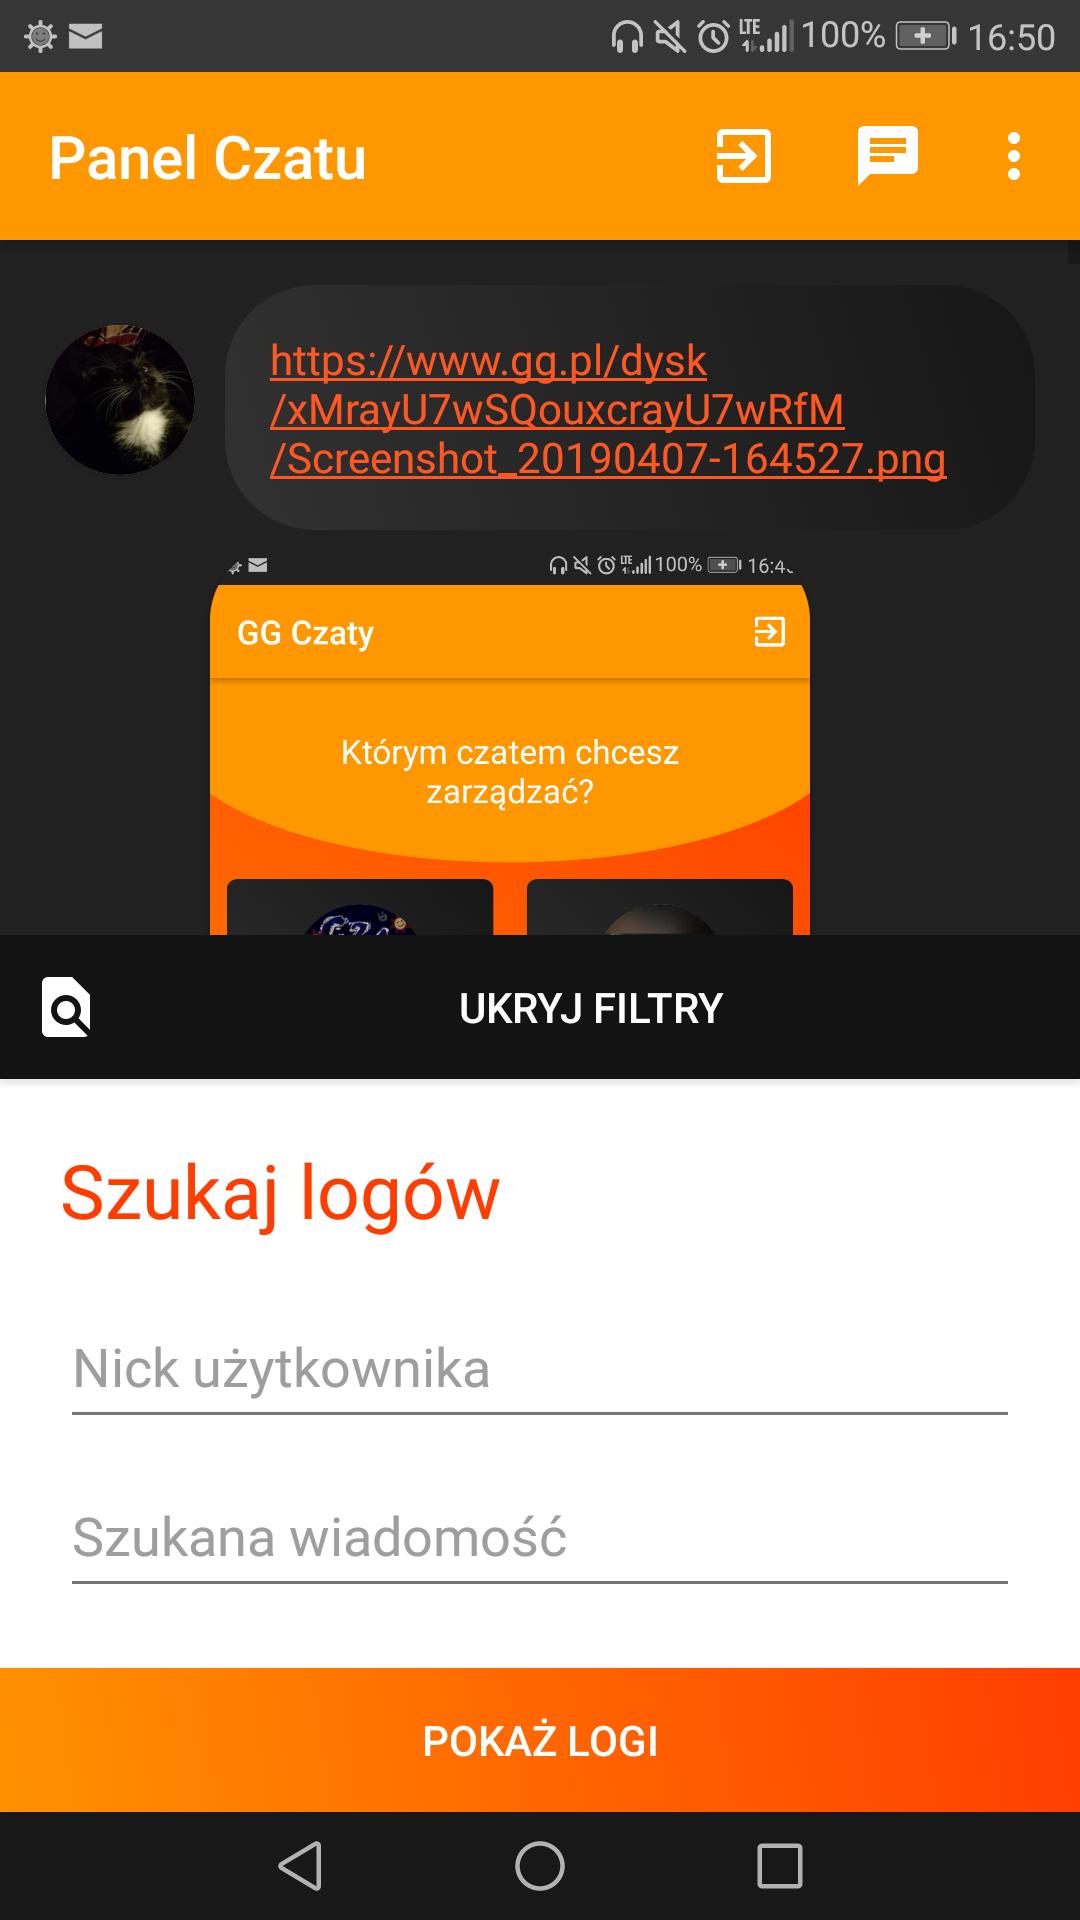 Screenshot_20190407-165015.png